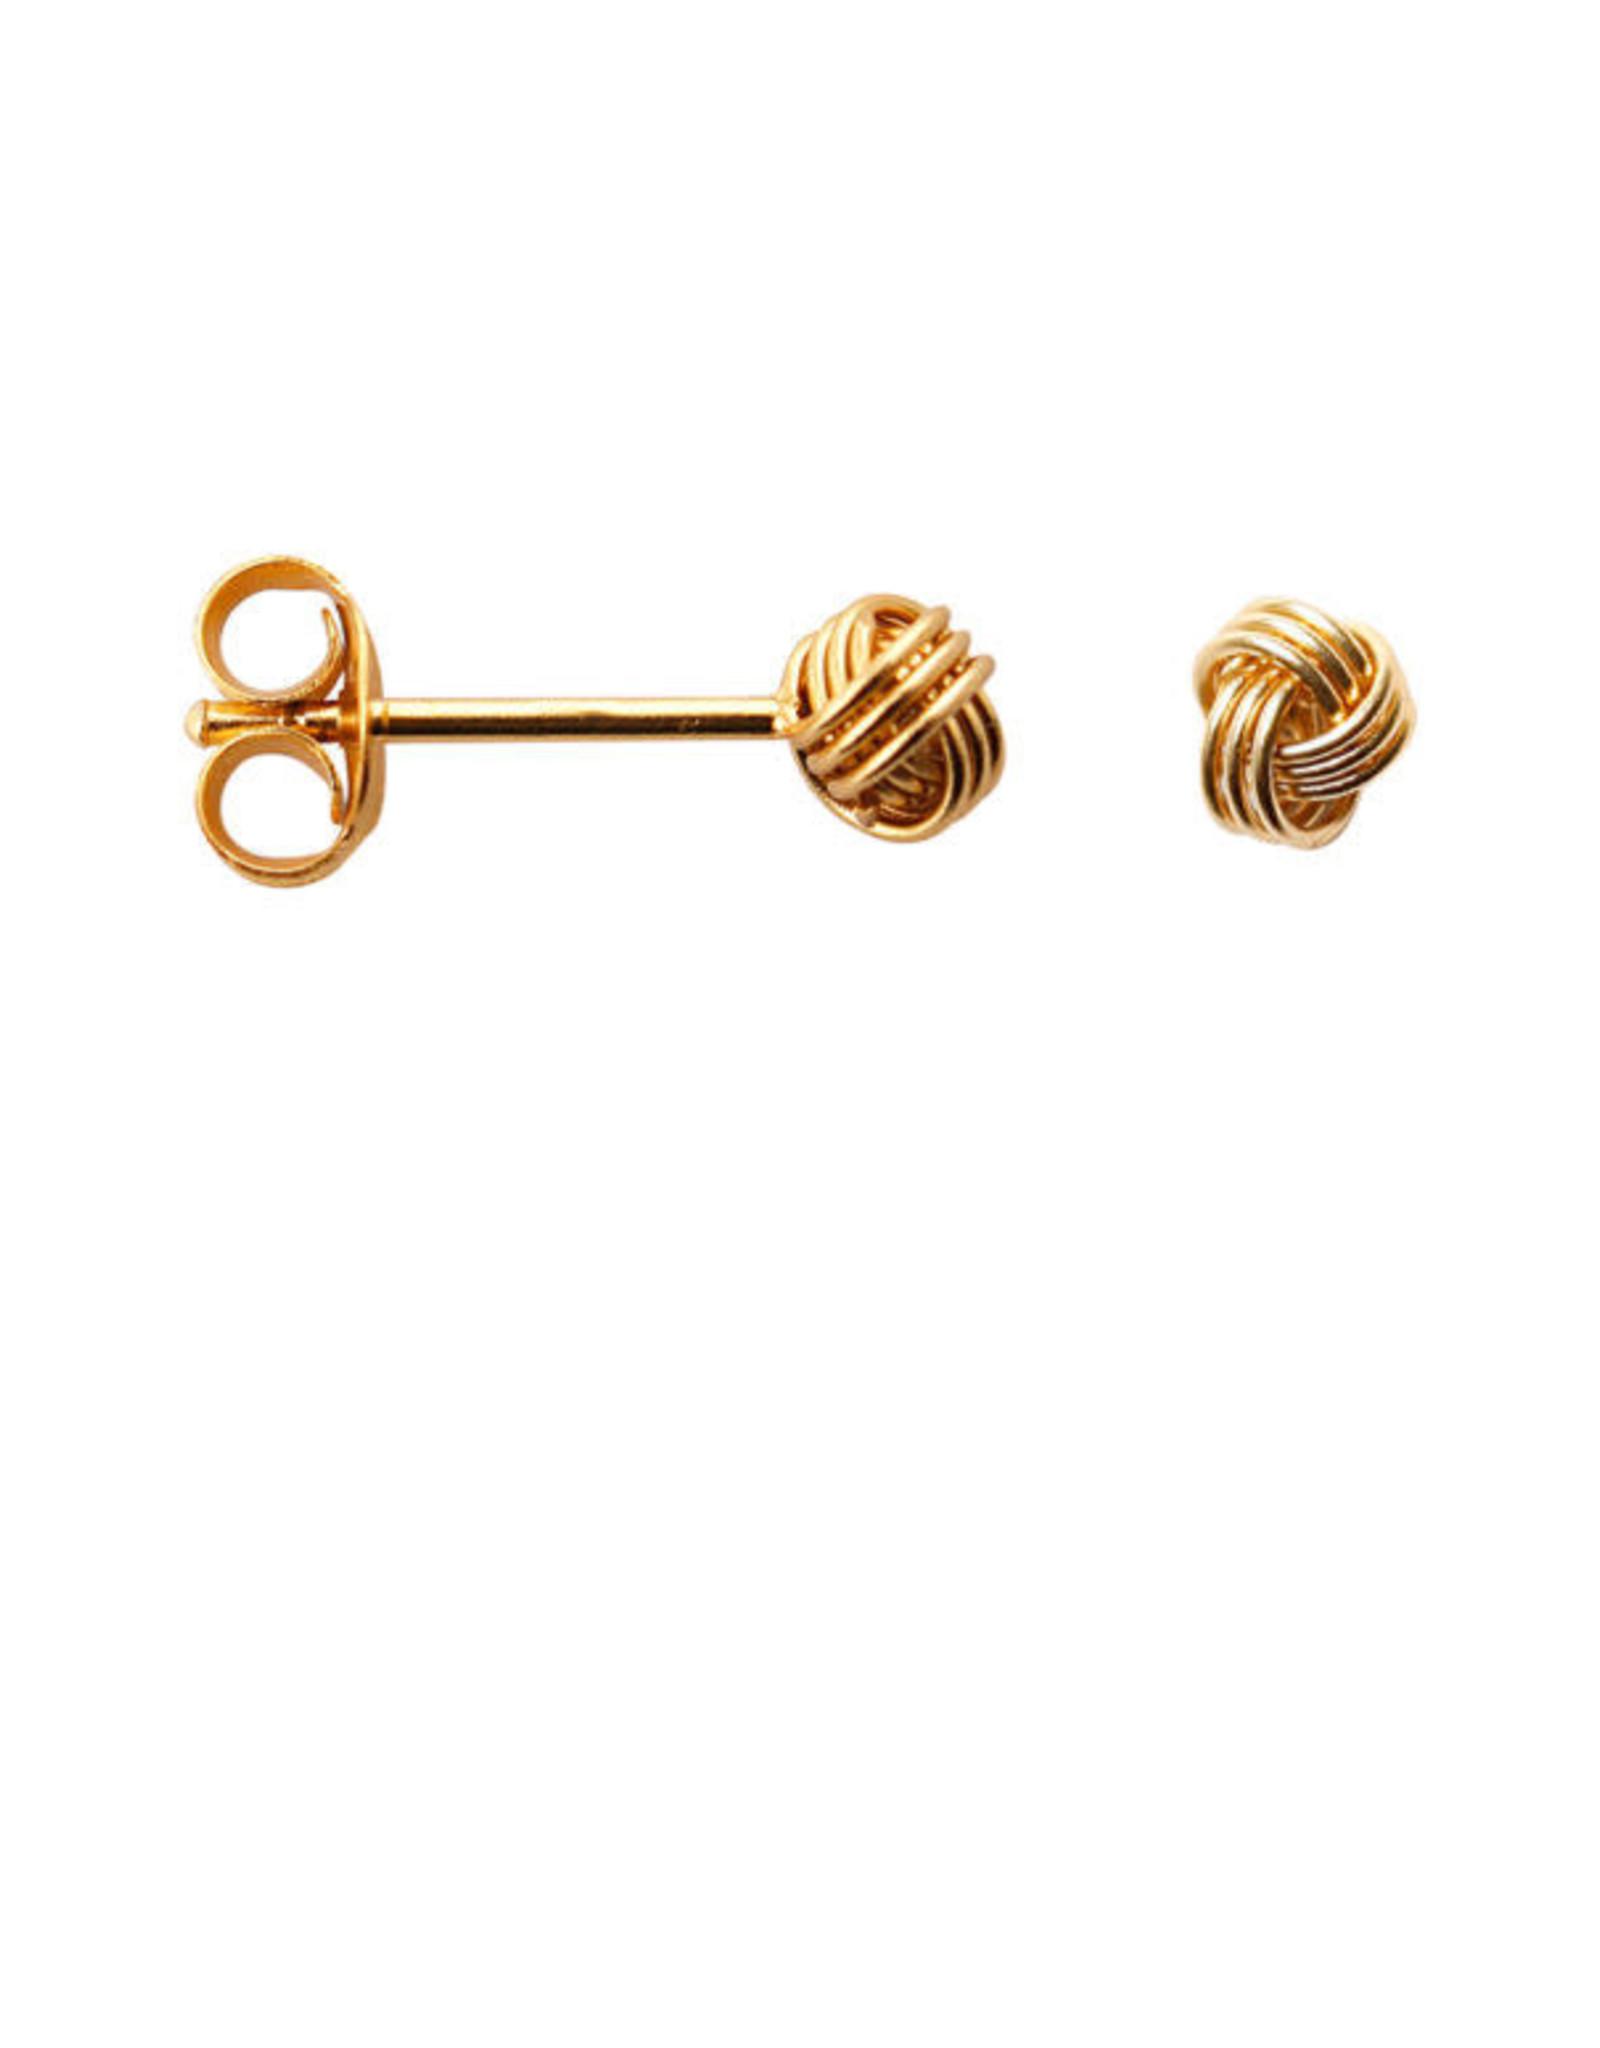 Label kiki label kiki knot earring gold